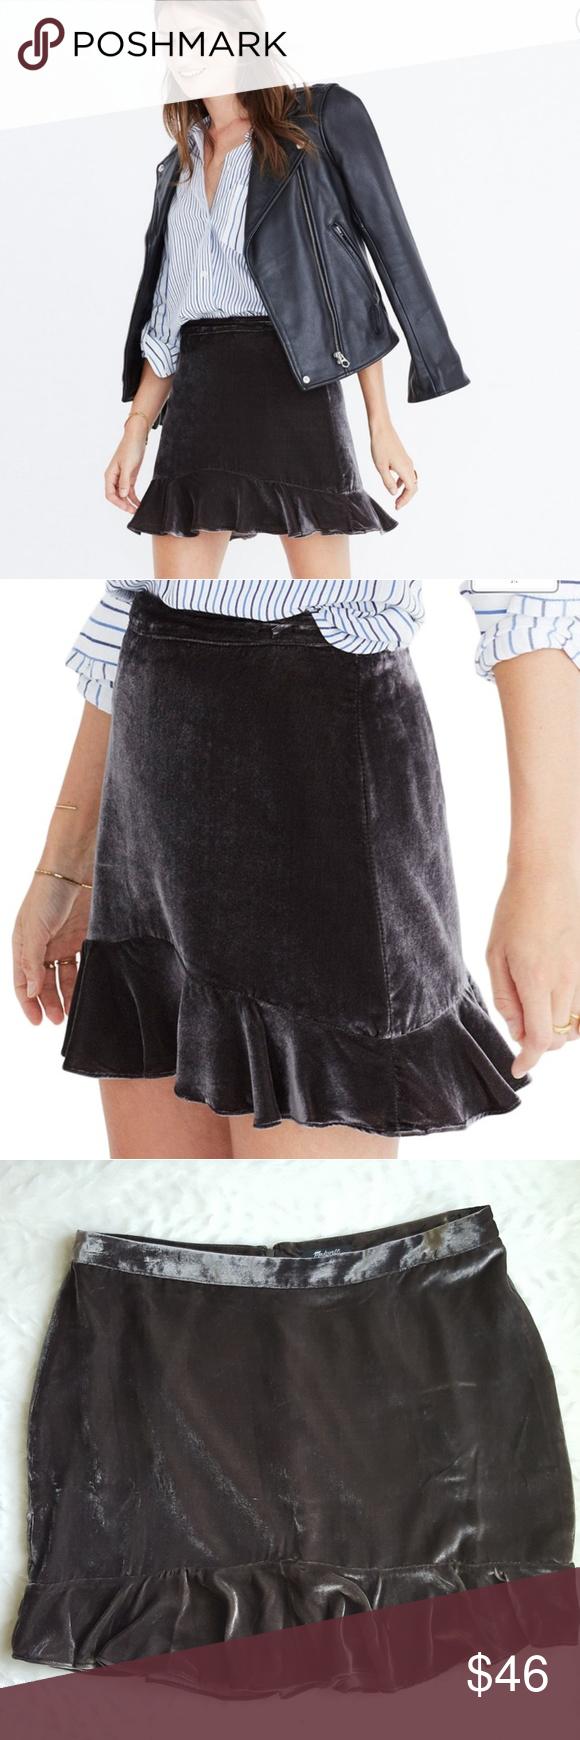 ad87a915a MADEWELL Velvet Ruffle Edge Mini Skirt Dark Metal New! From Madewell: